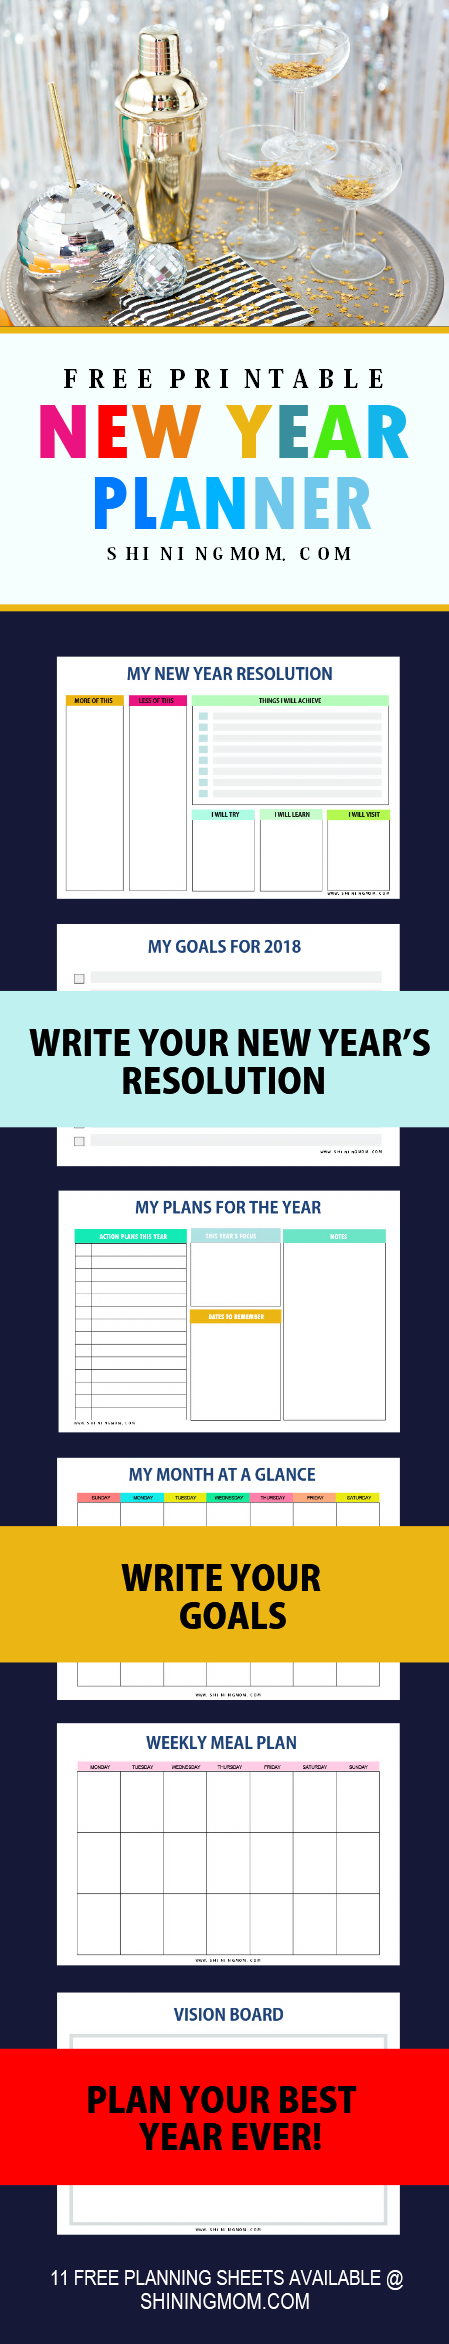 printable year planner 2018